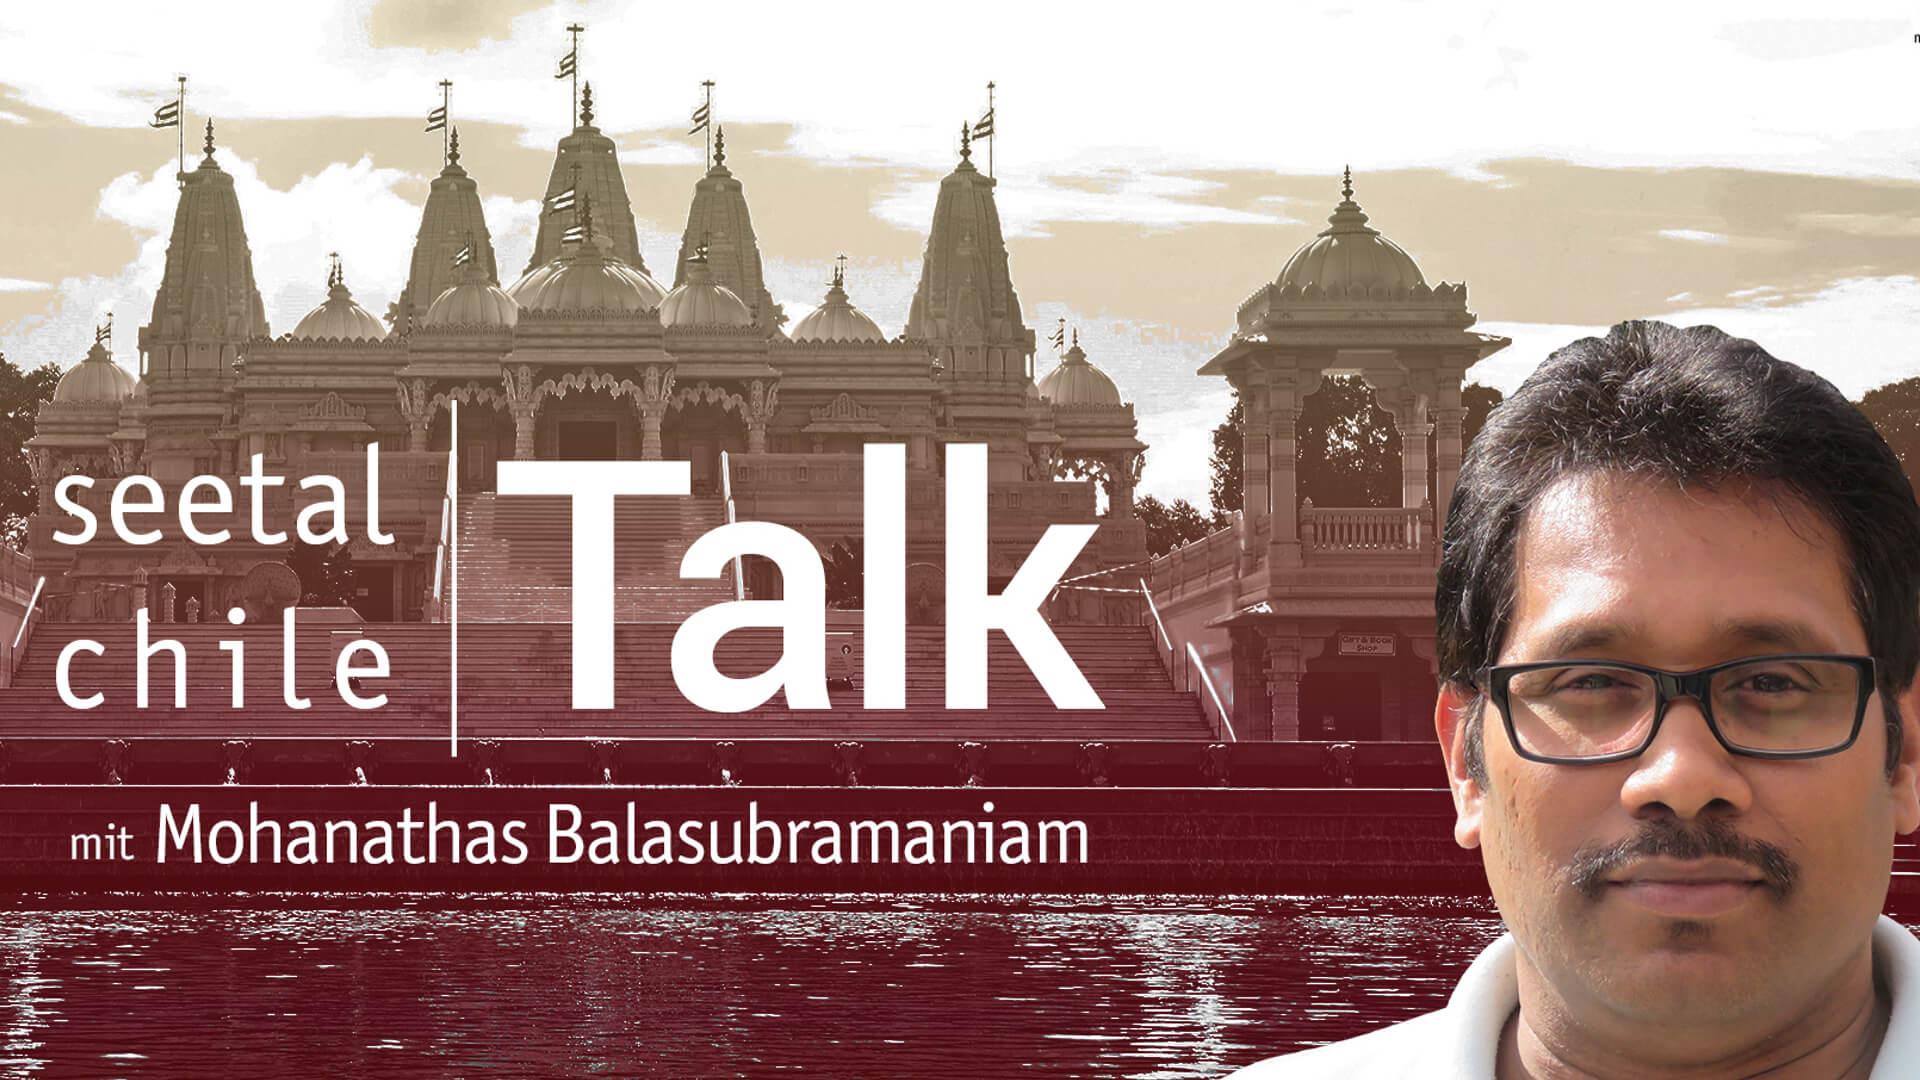 seetal chile Talk mit Mohanathas Balasubramaniam